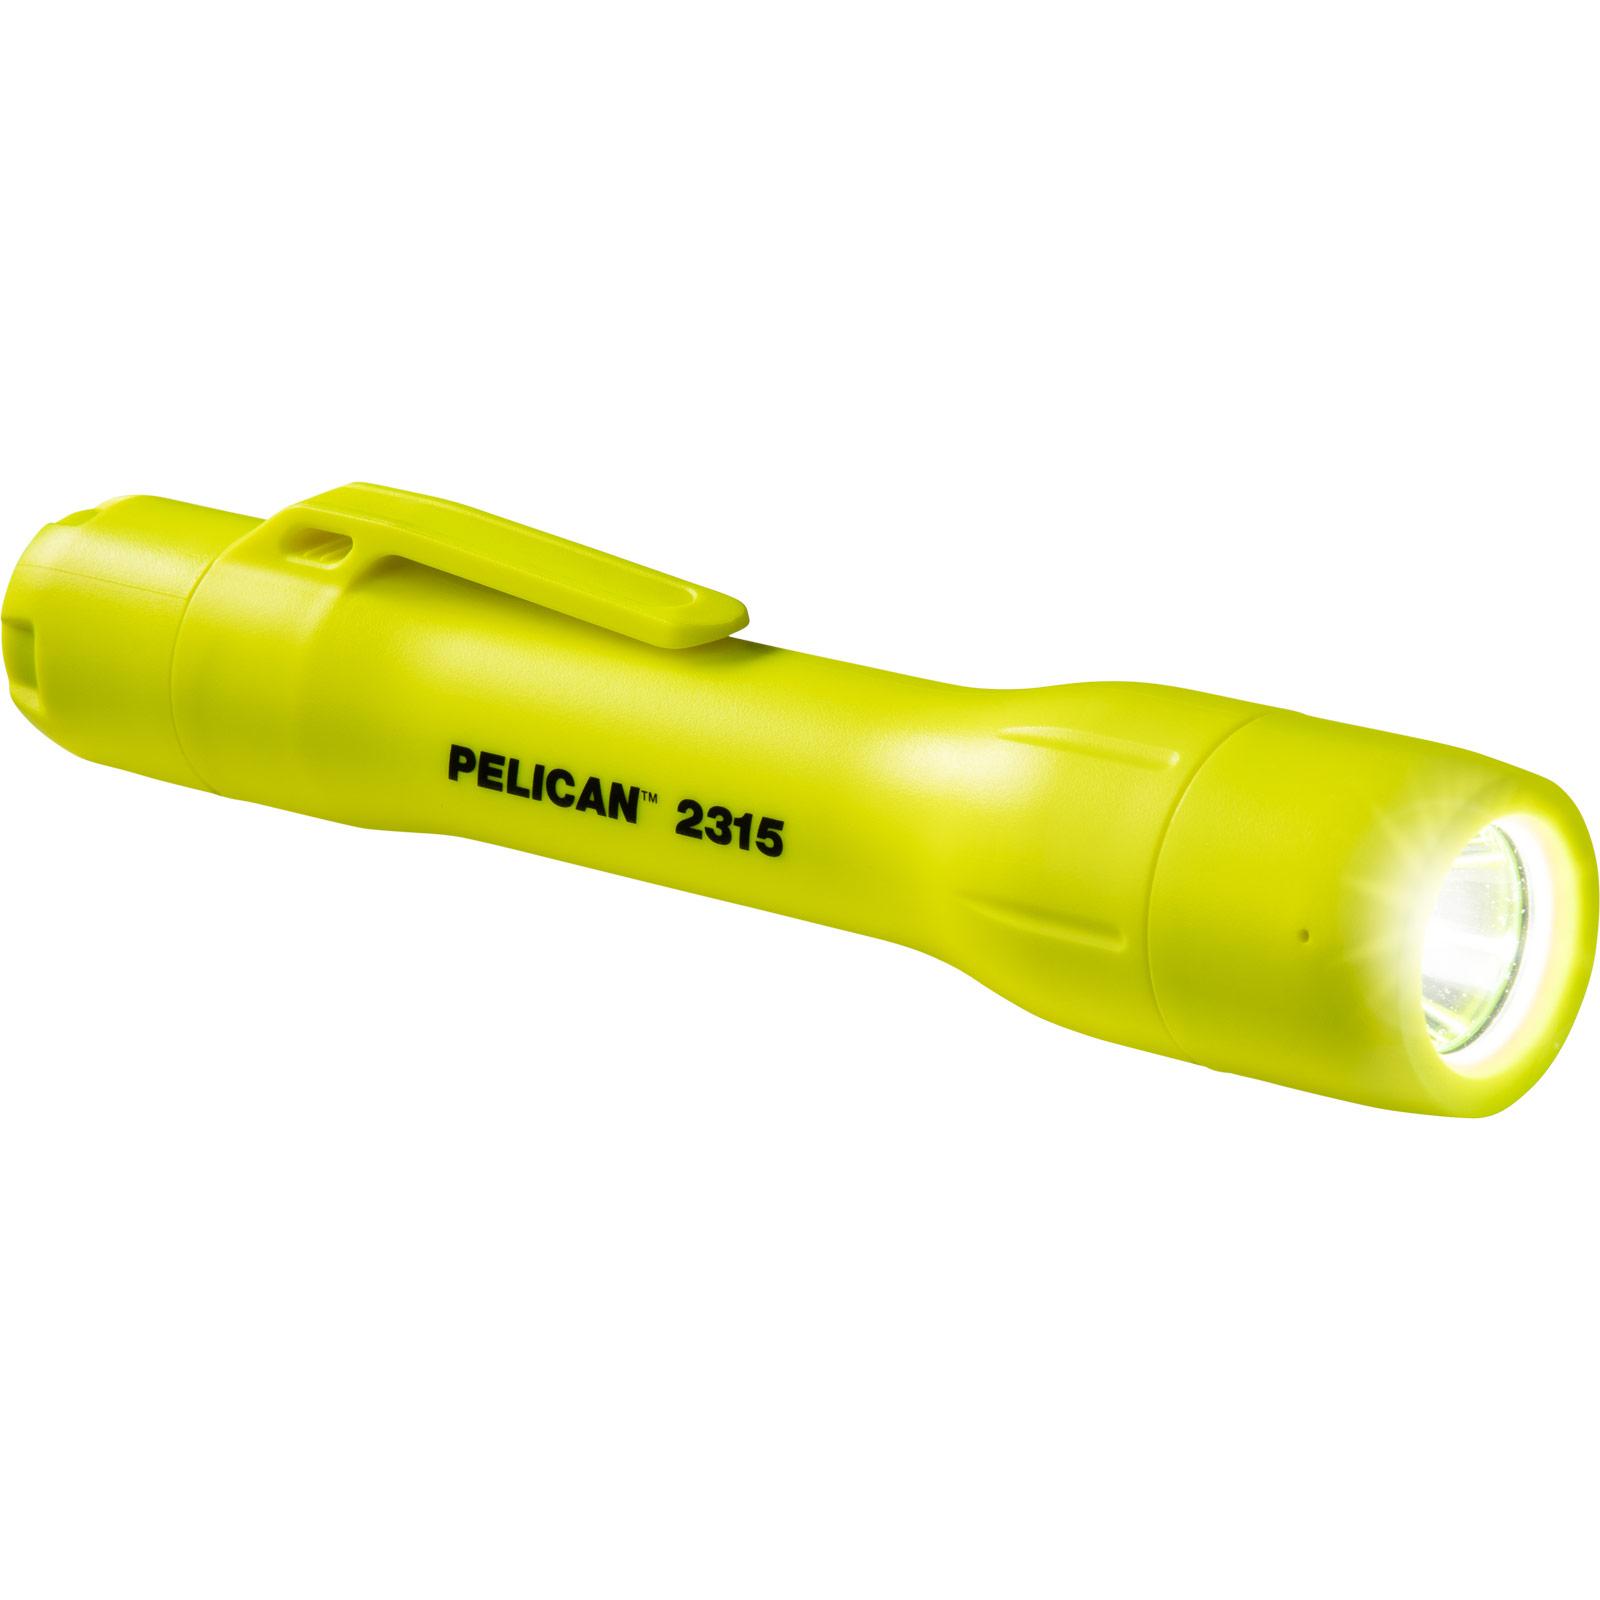 pelican 2315 safety flashlight